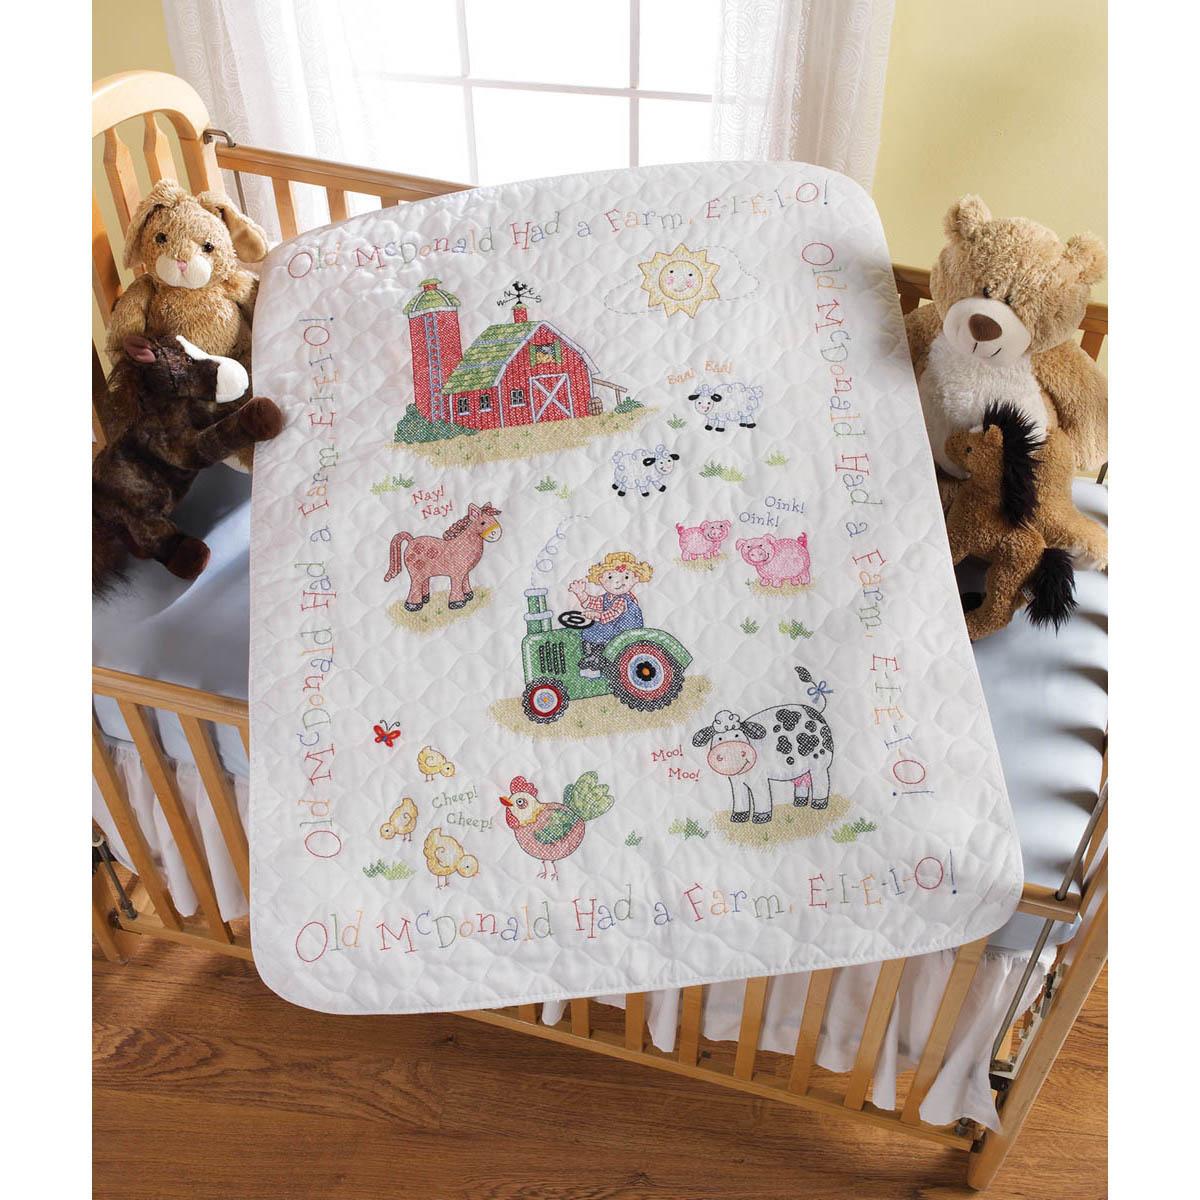 Bucilla ® Baby - Stamped Cross Stitch - Crib Ensembles - On the Farm  - Crib Cover Kit - 45567